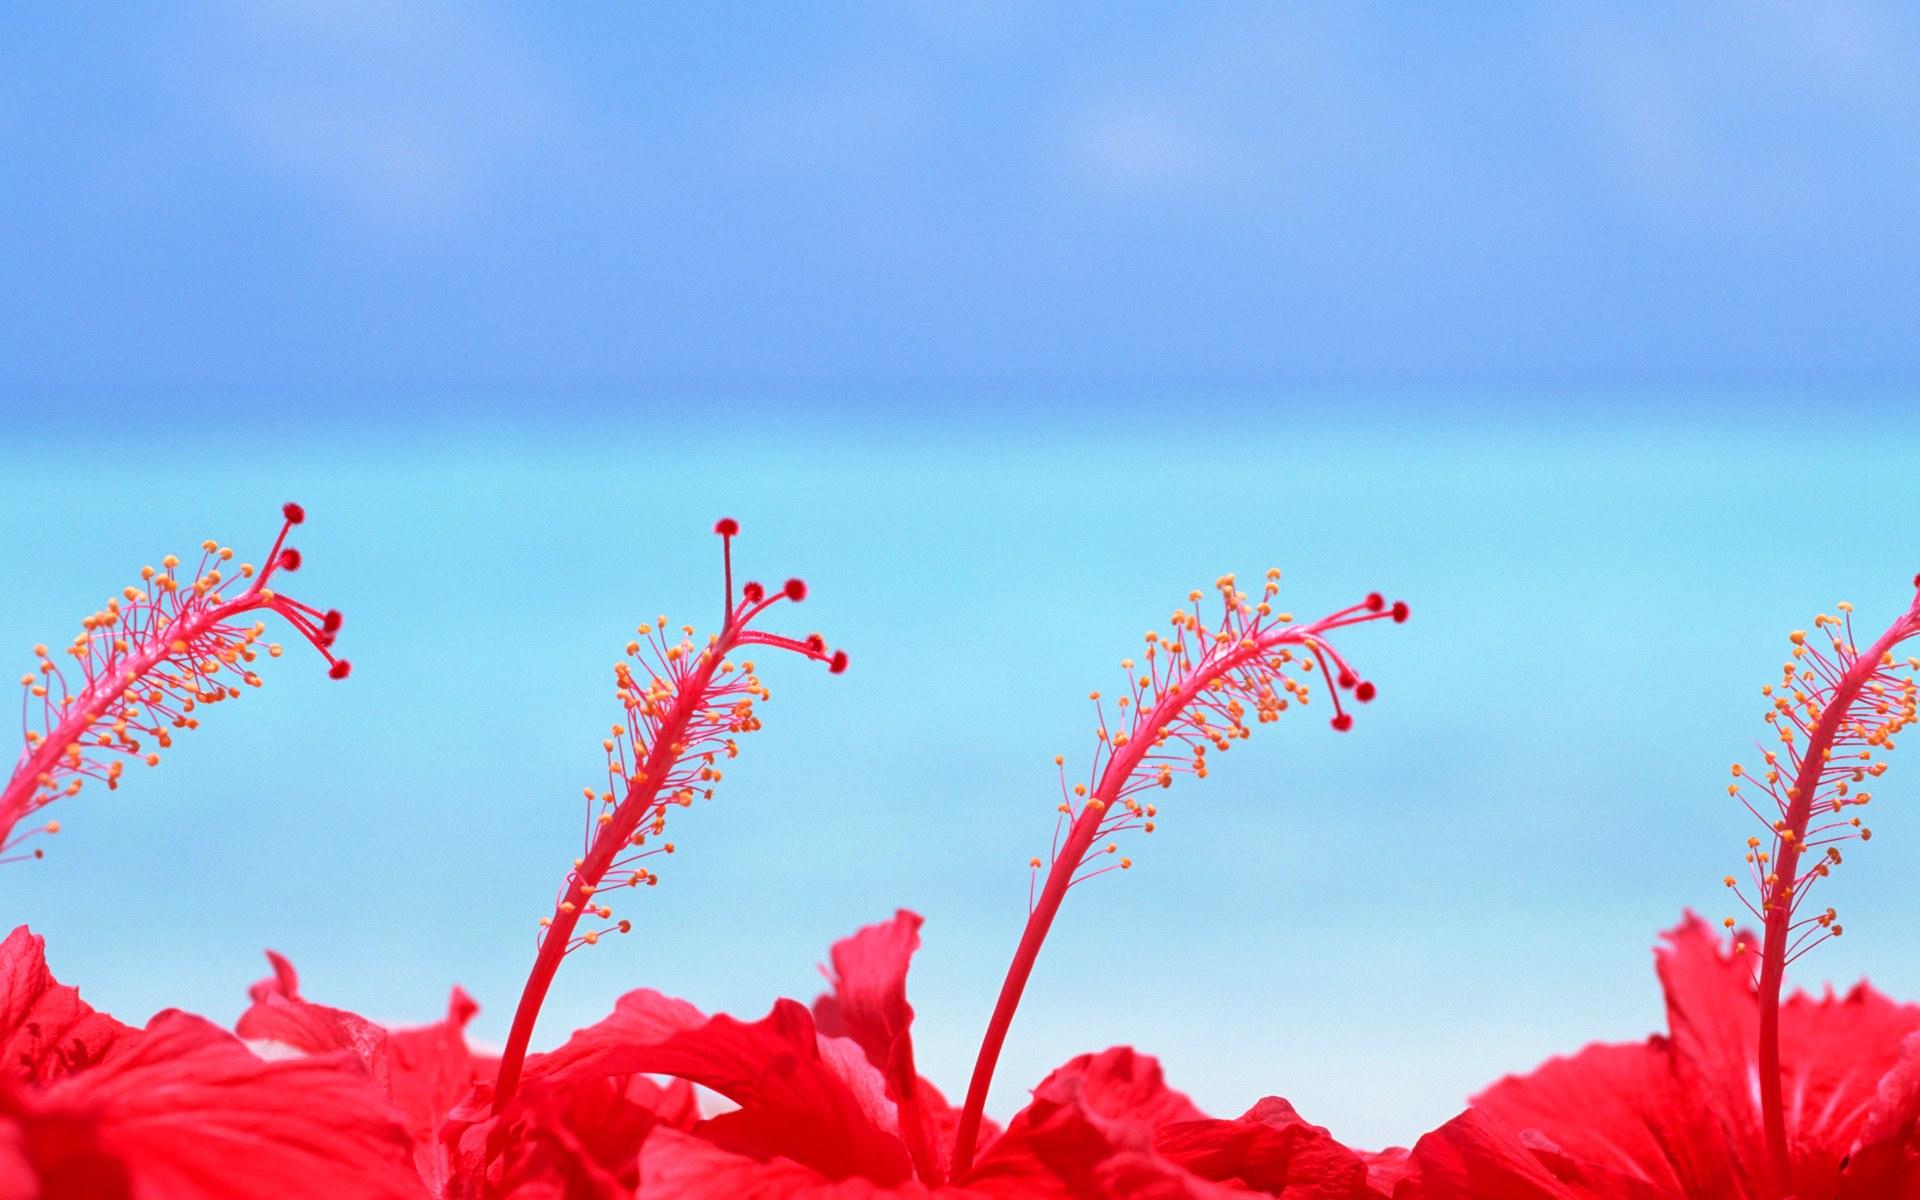 maldives hibiscus flowers wallpaper | 1920x1200 | 5484 | wallpaperup